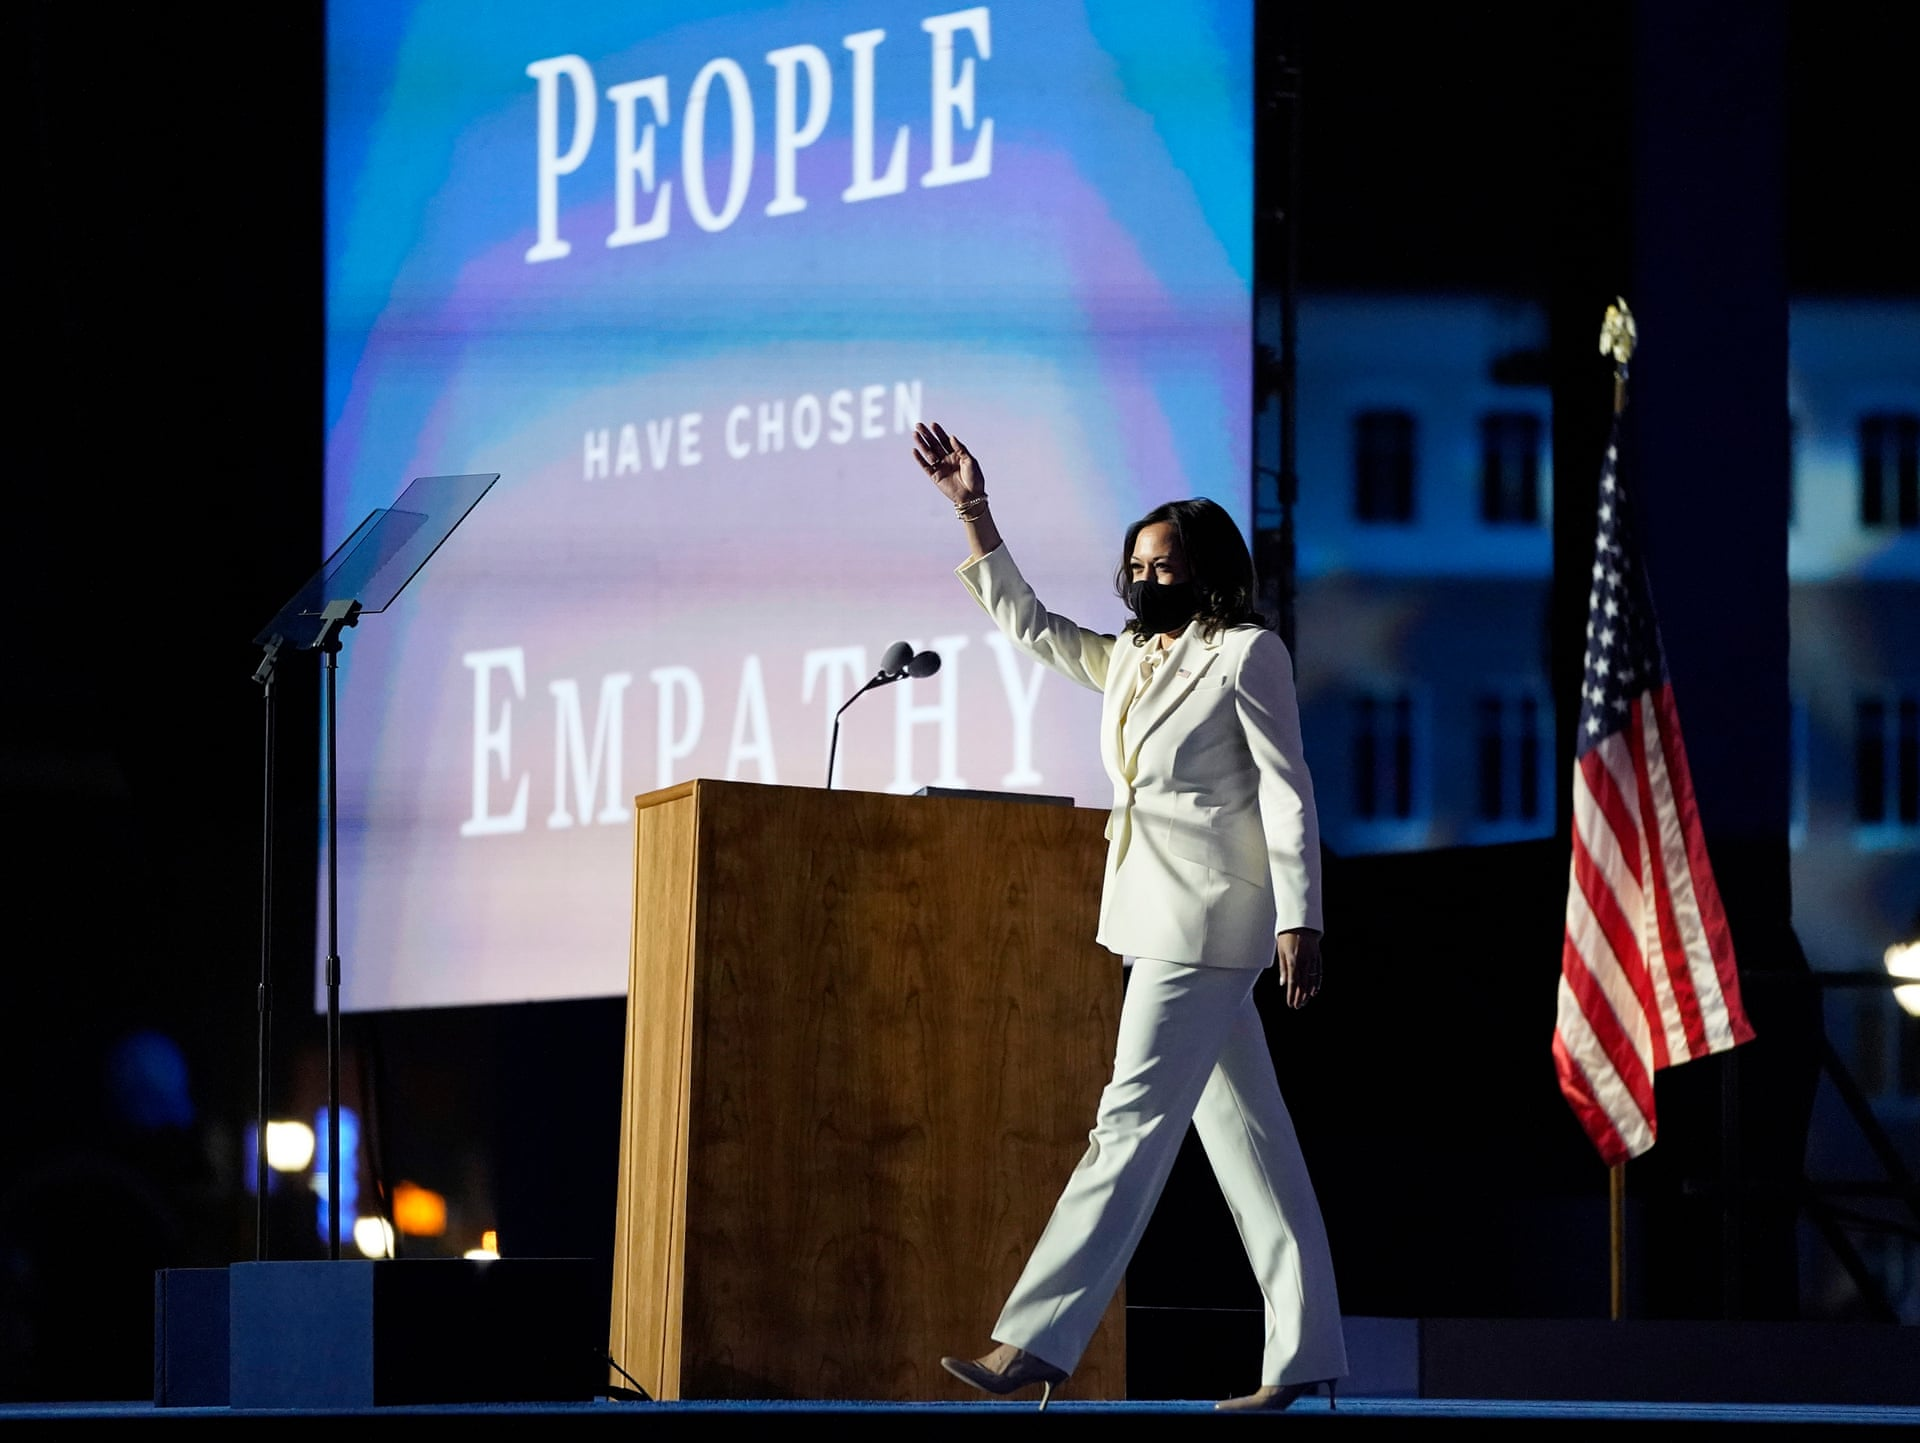 Kamala HARRIS_People have chosen Empathy